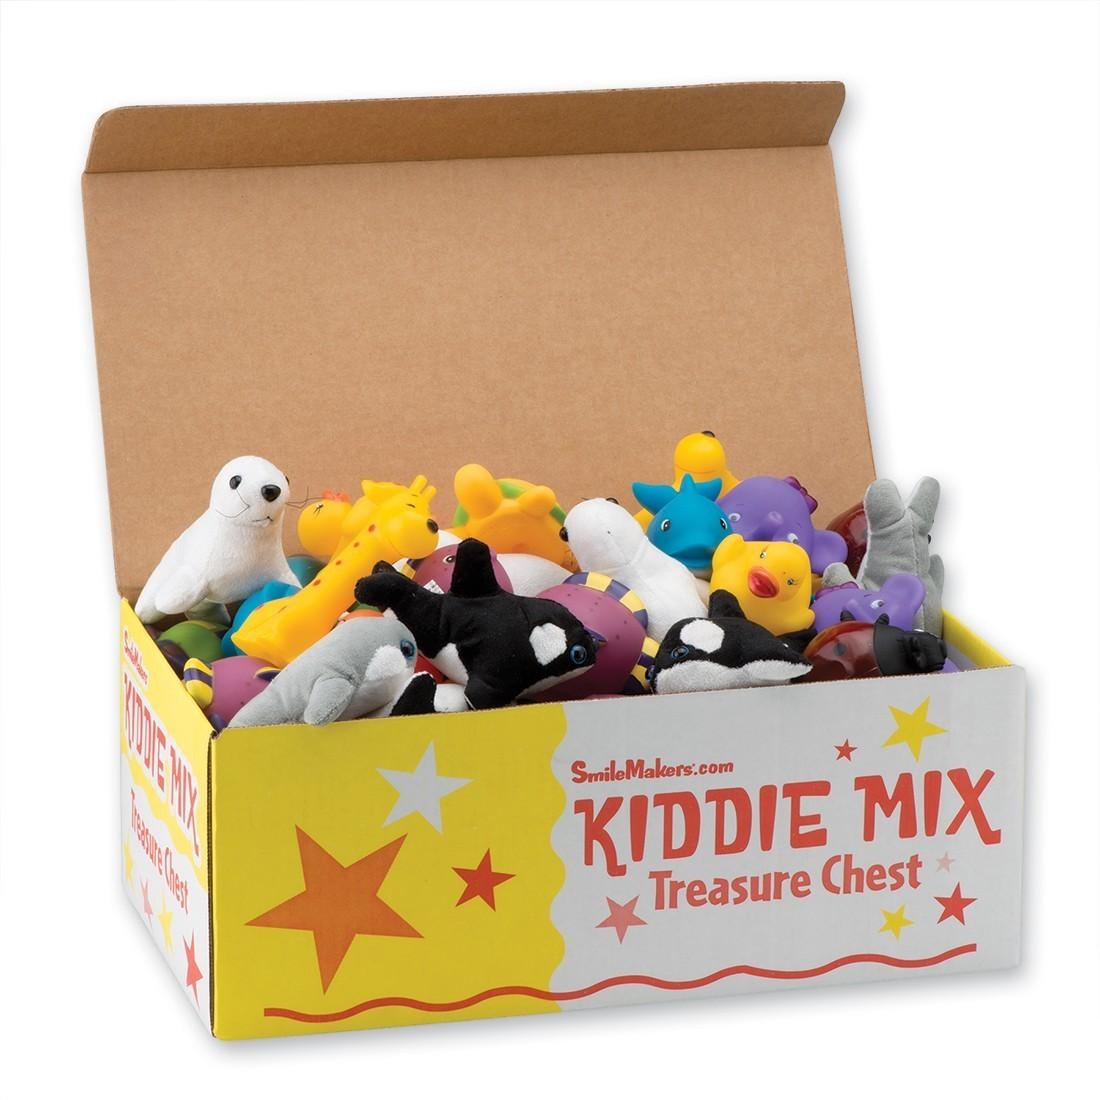 Kiddie Mix Treasure Chest [image]